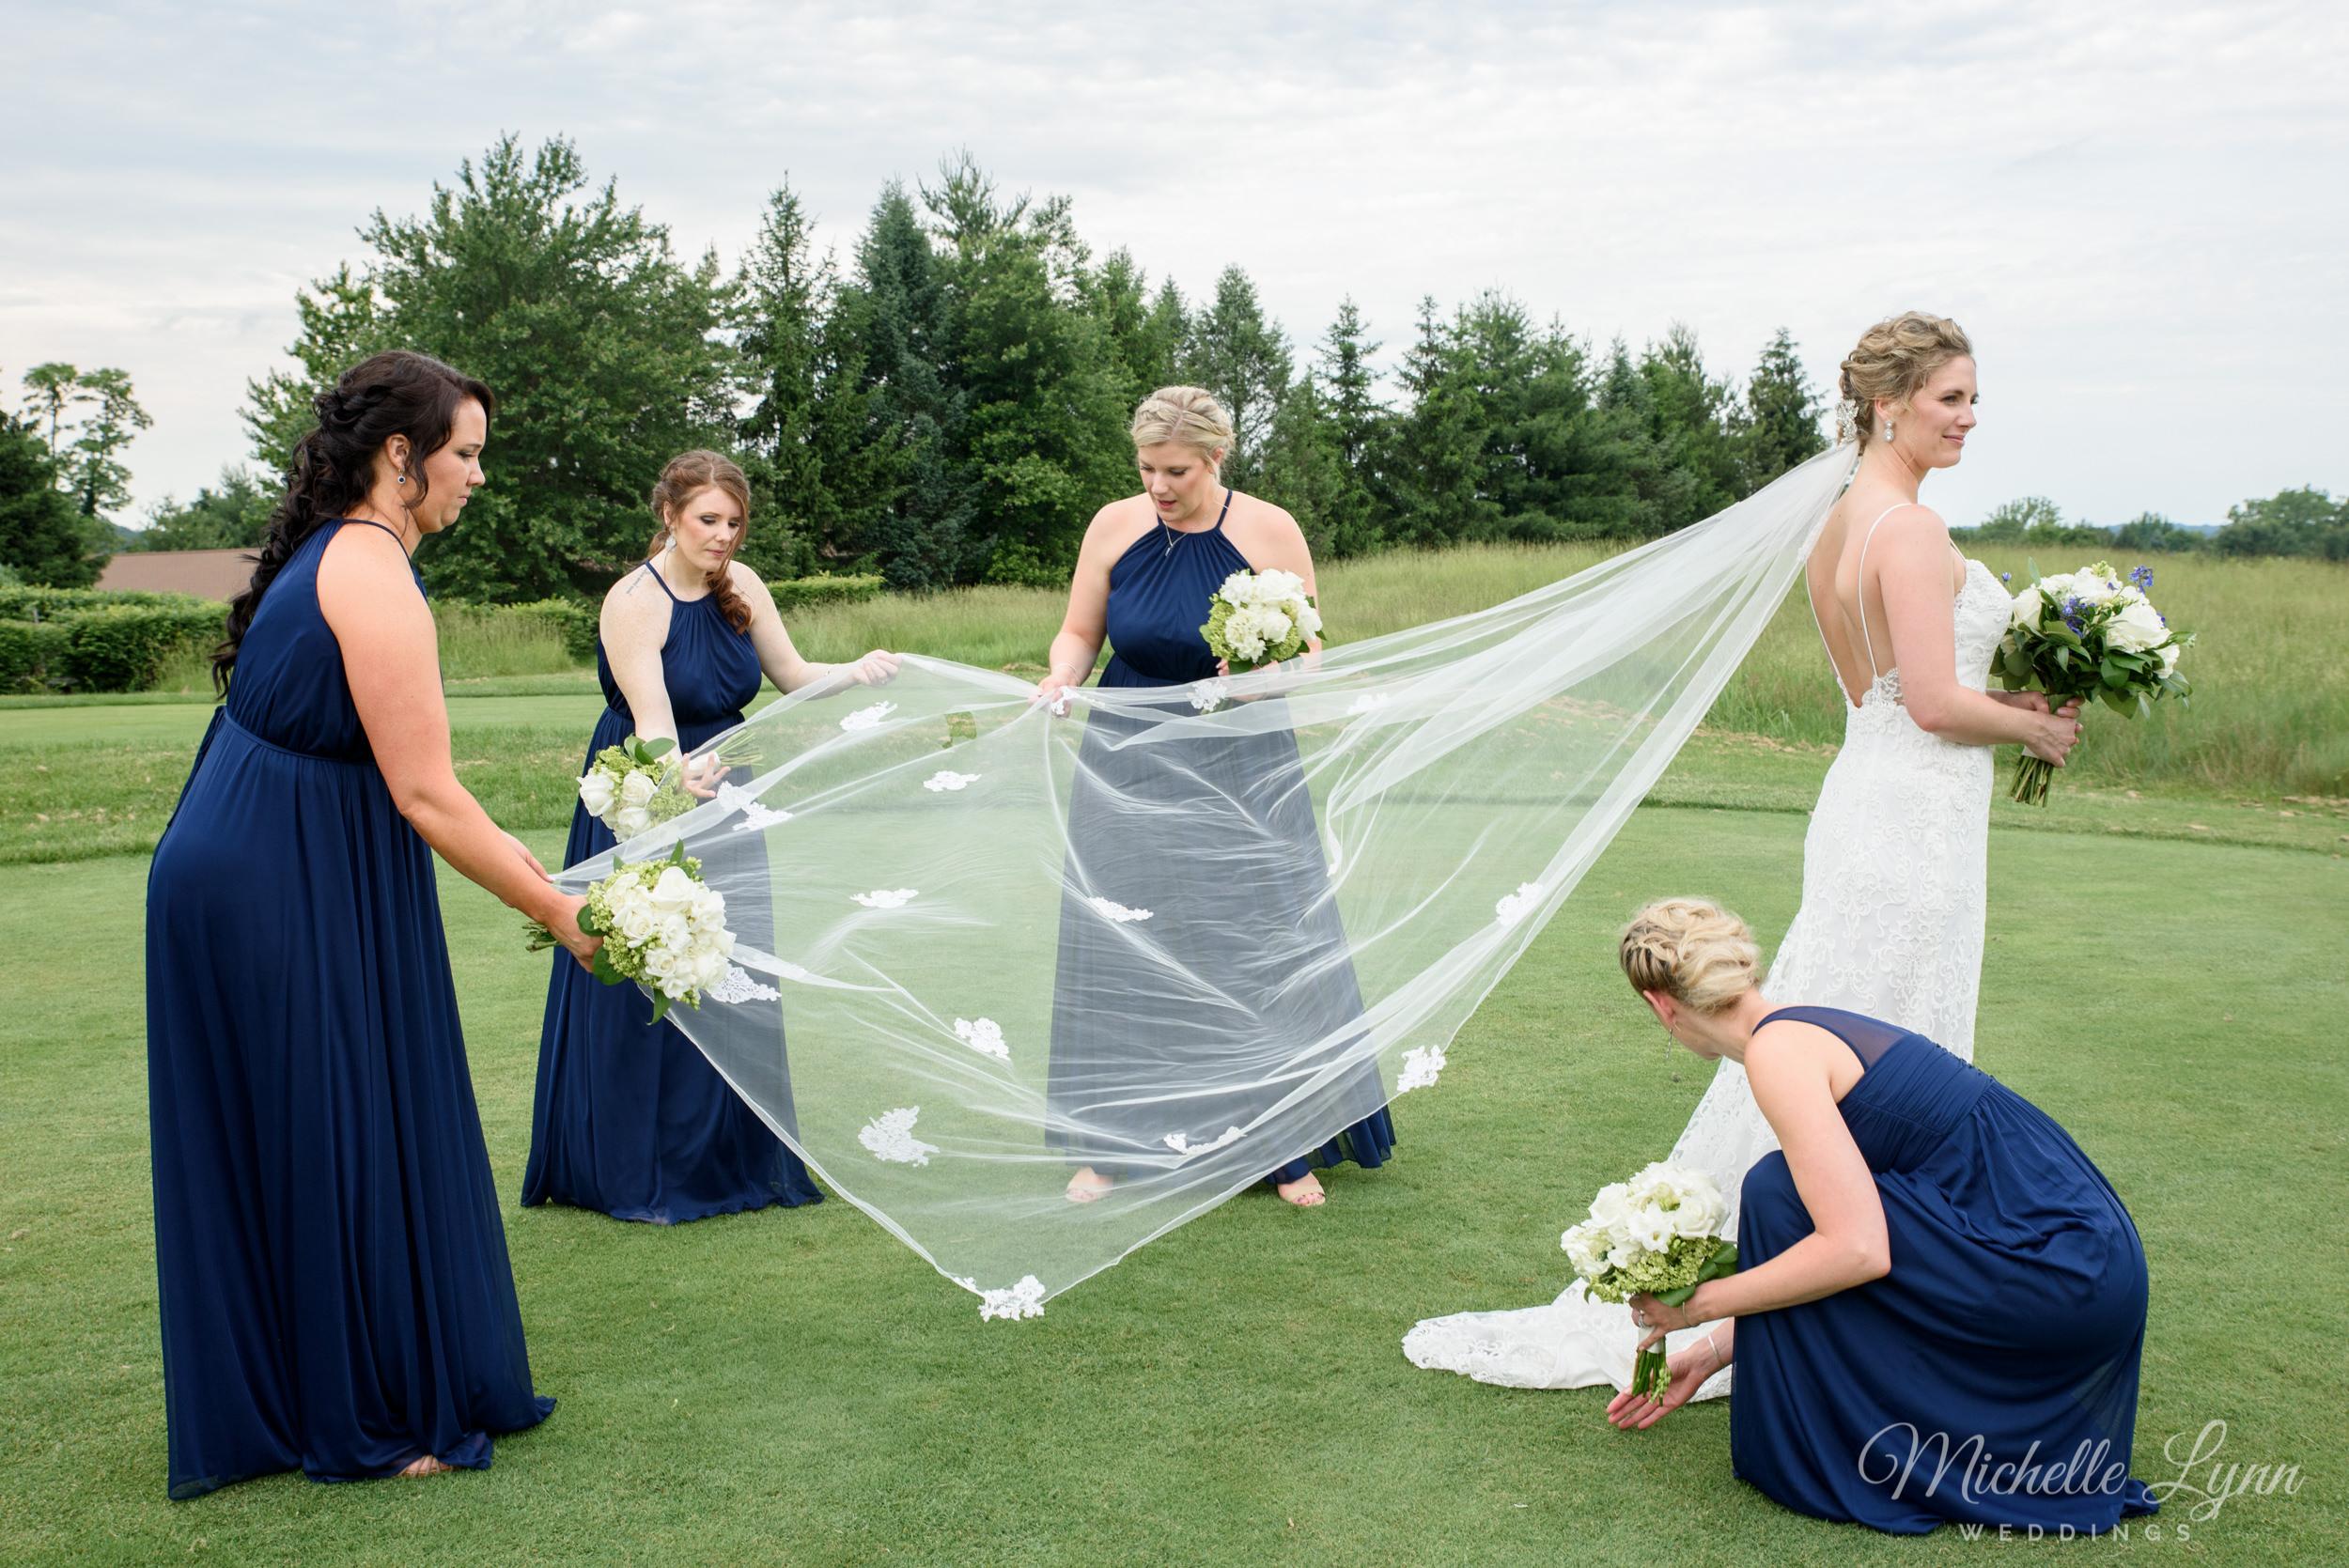 mlw-jericho-national-golf-club-wedding-photography-11.jpg